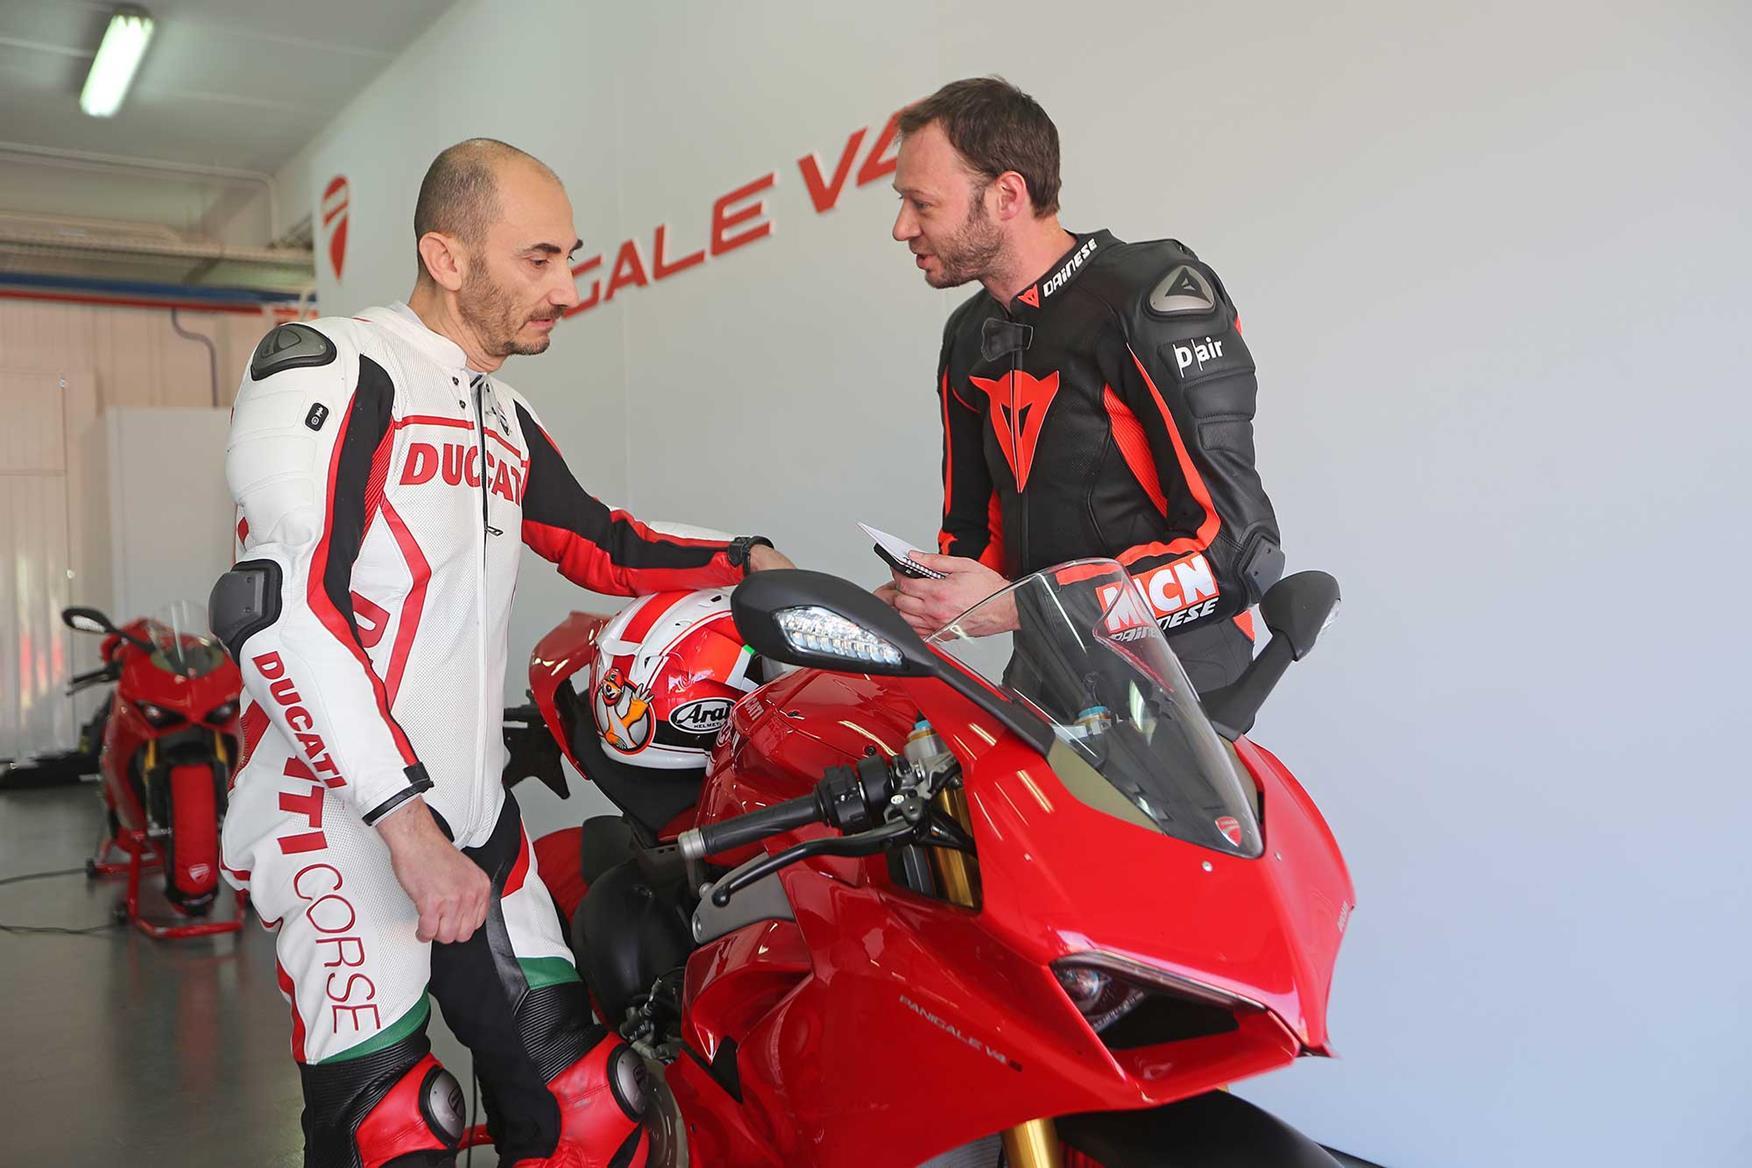 MCN discuss the V4 S with Ducati's CEO Claudio Domenicali